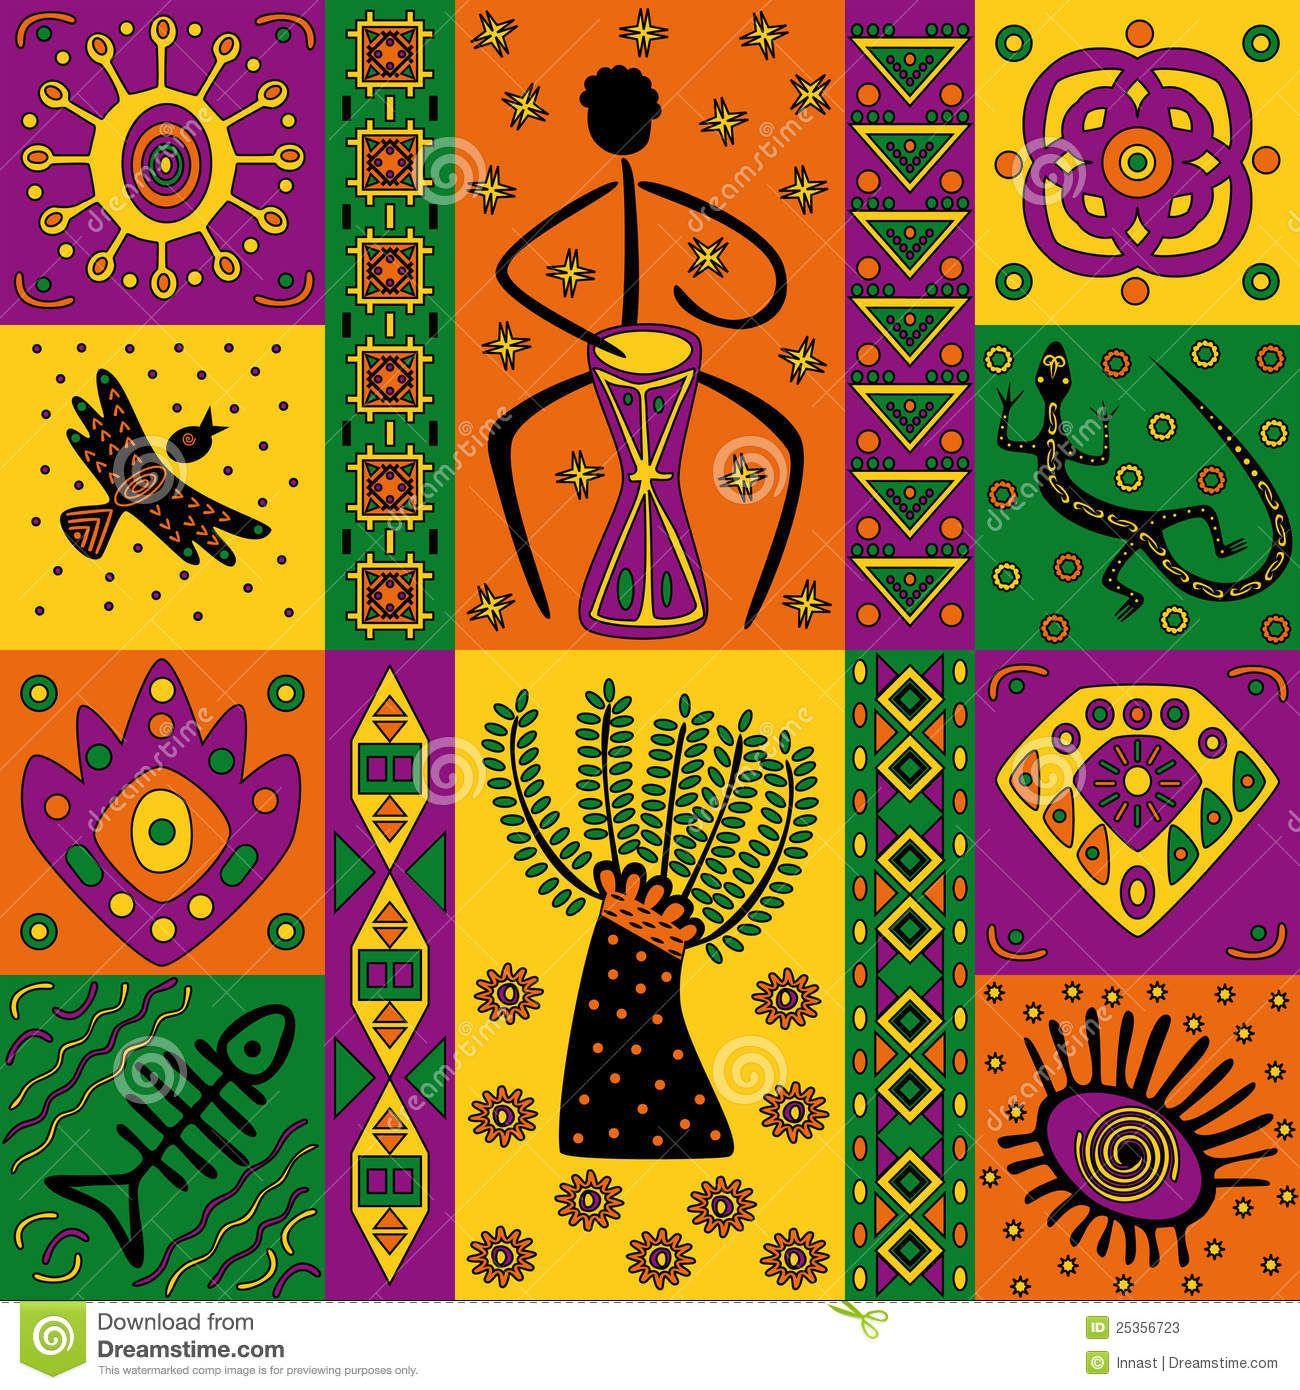 africanpattern25356723.jpg (1300×1390) African pattern